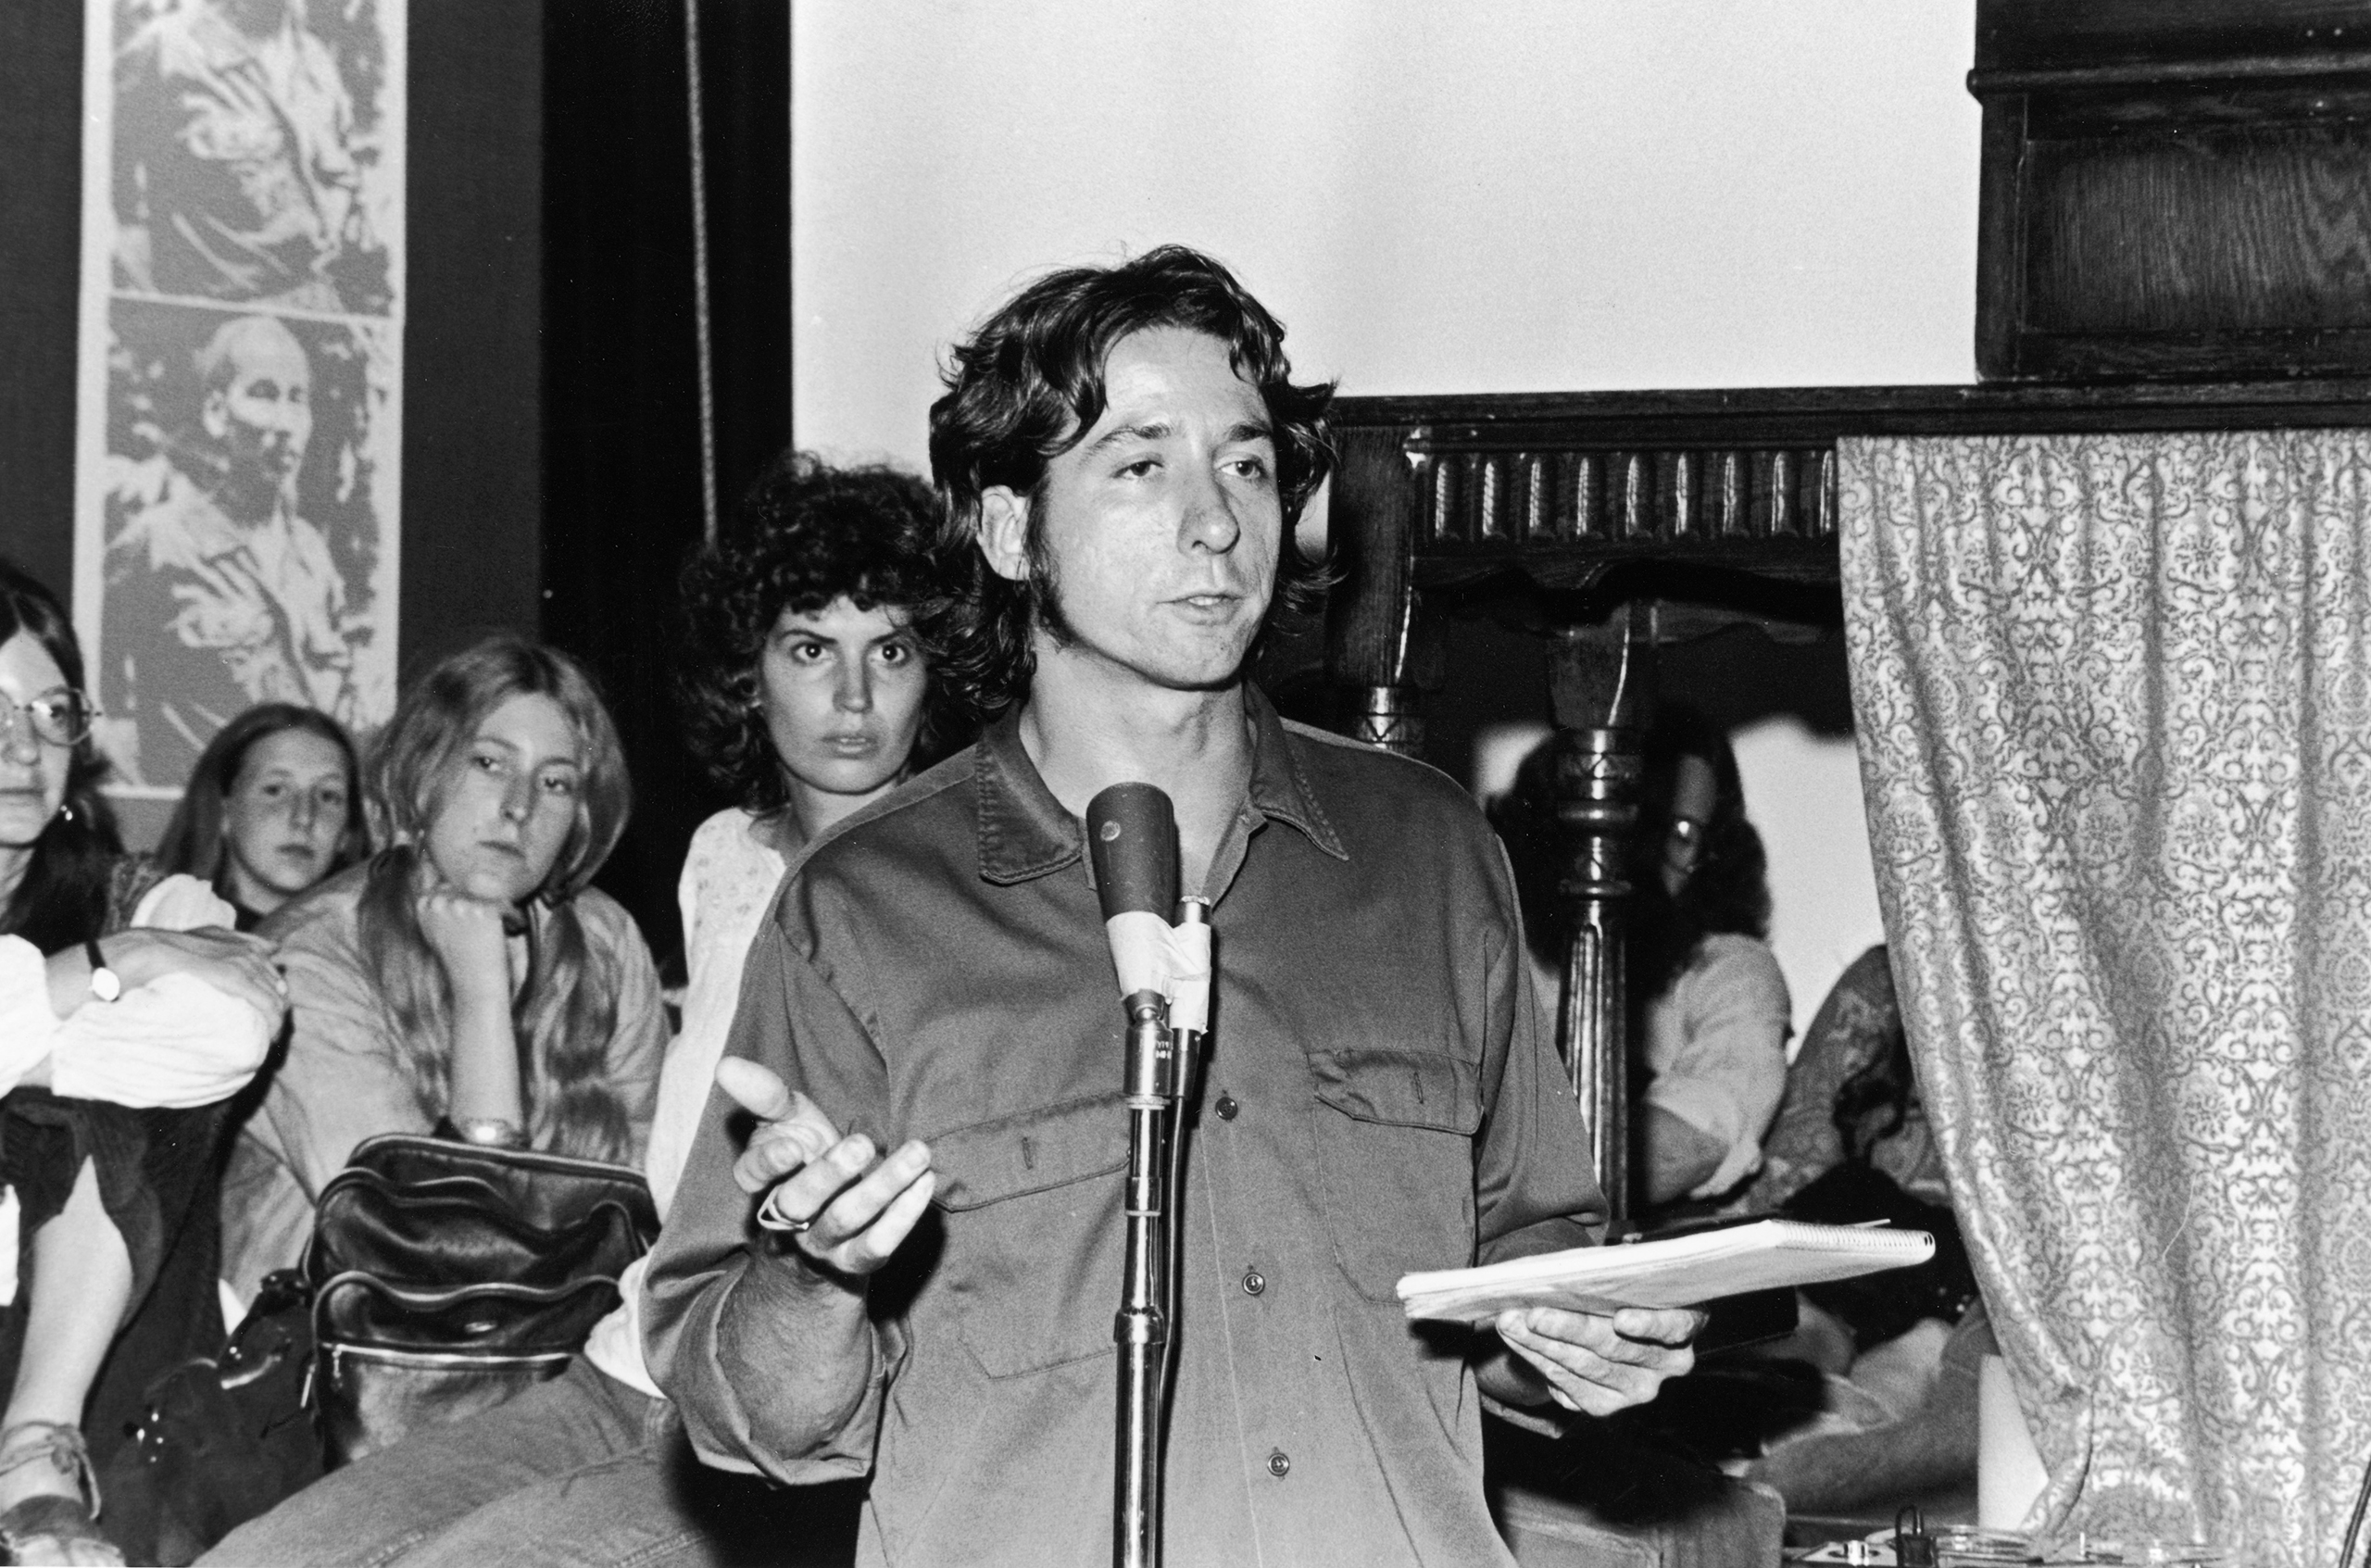 Peace activist Tom Hayden speaks in New York in September 1972